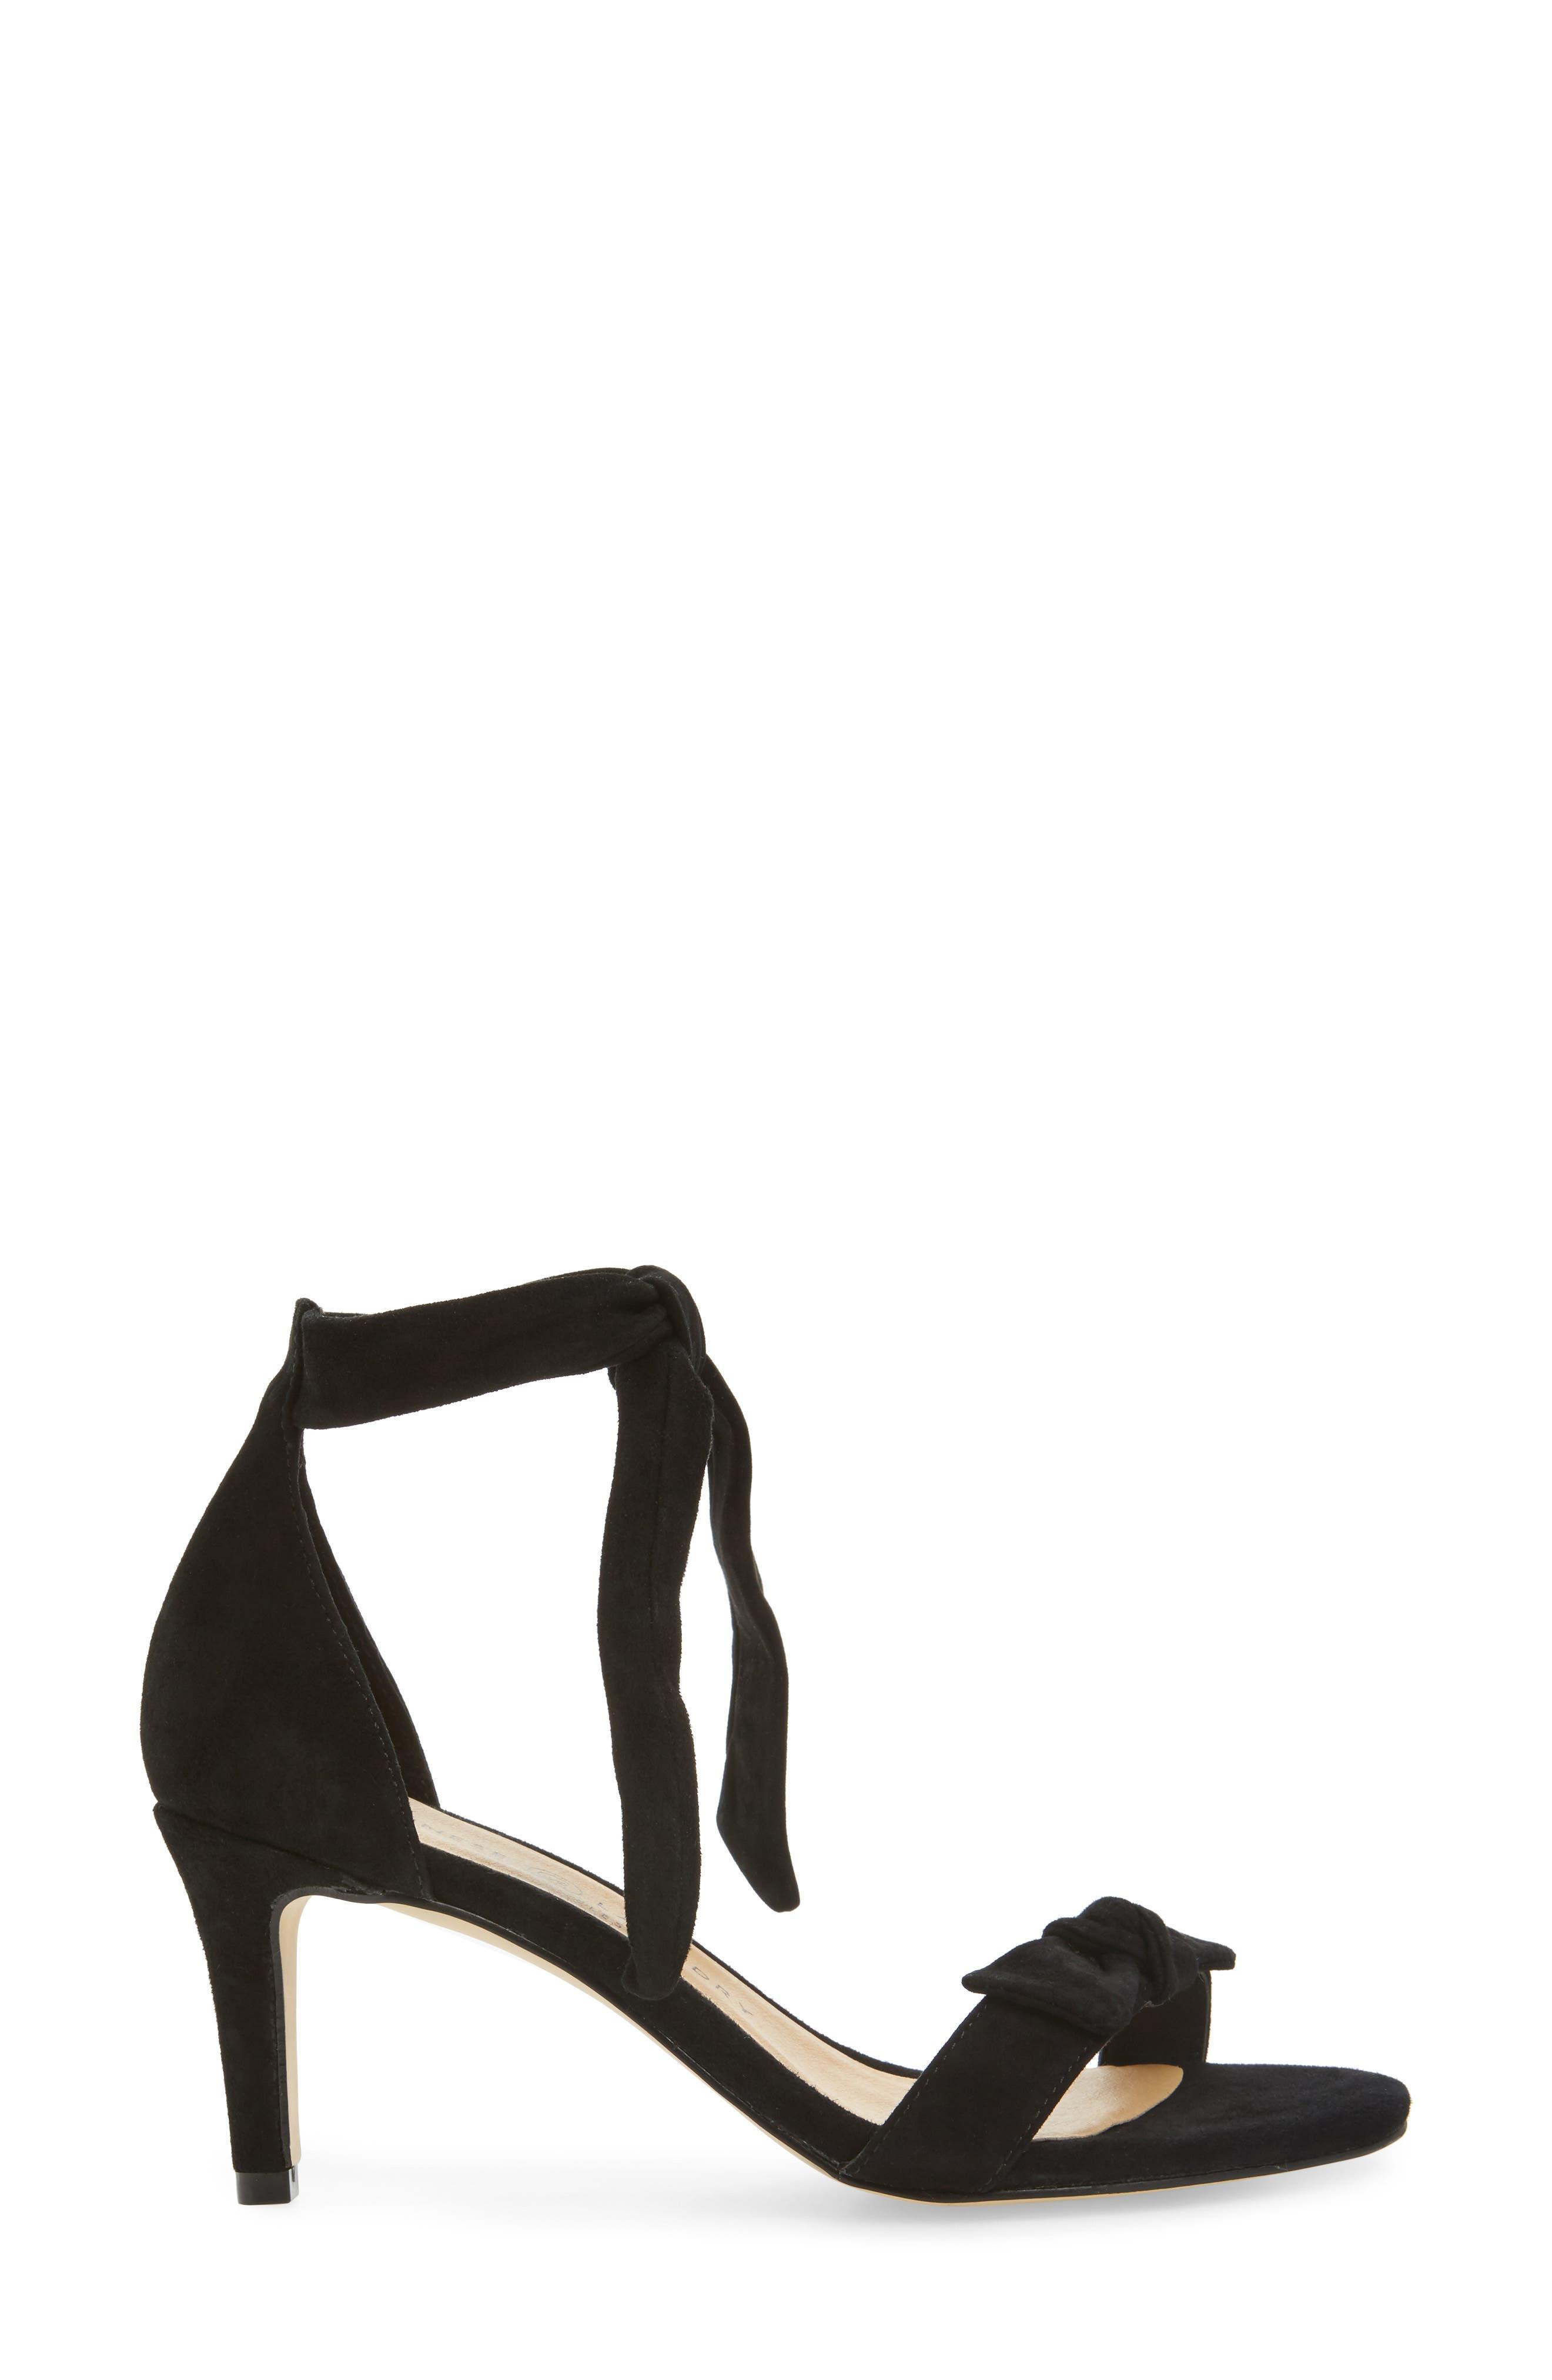 Rhonda Ankle Tie Sandal,                             Alternate thumbnail 3, color,                             001